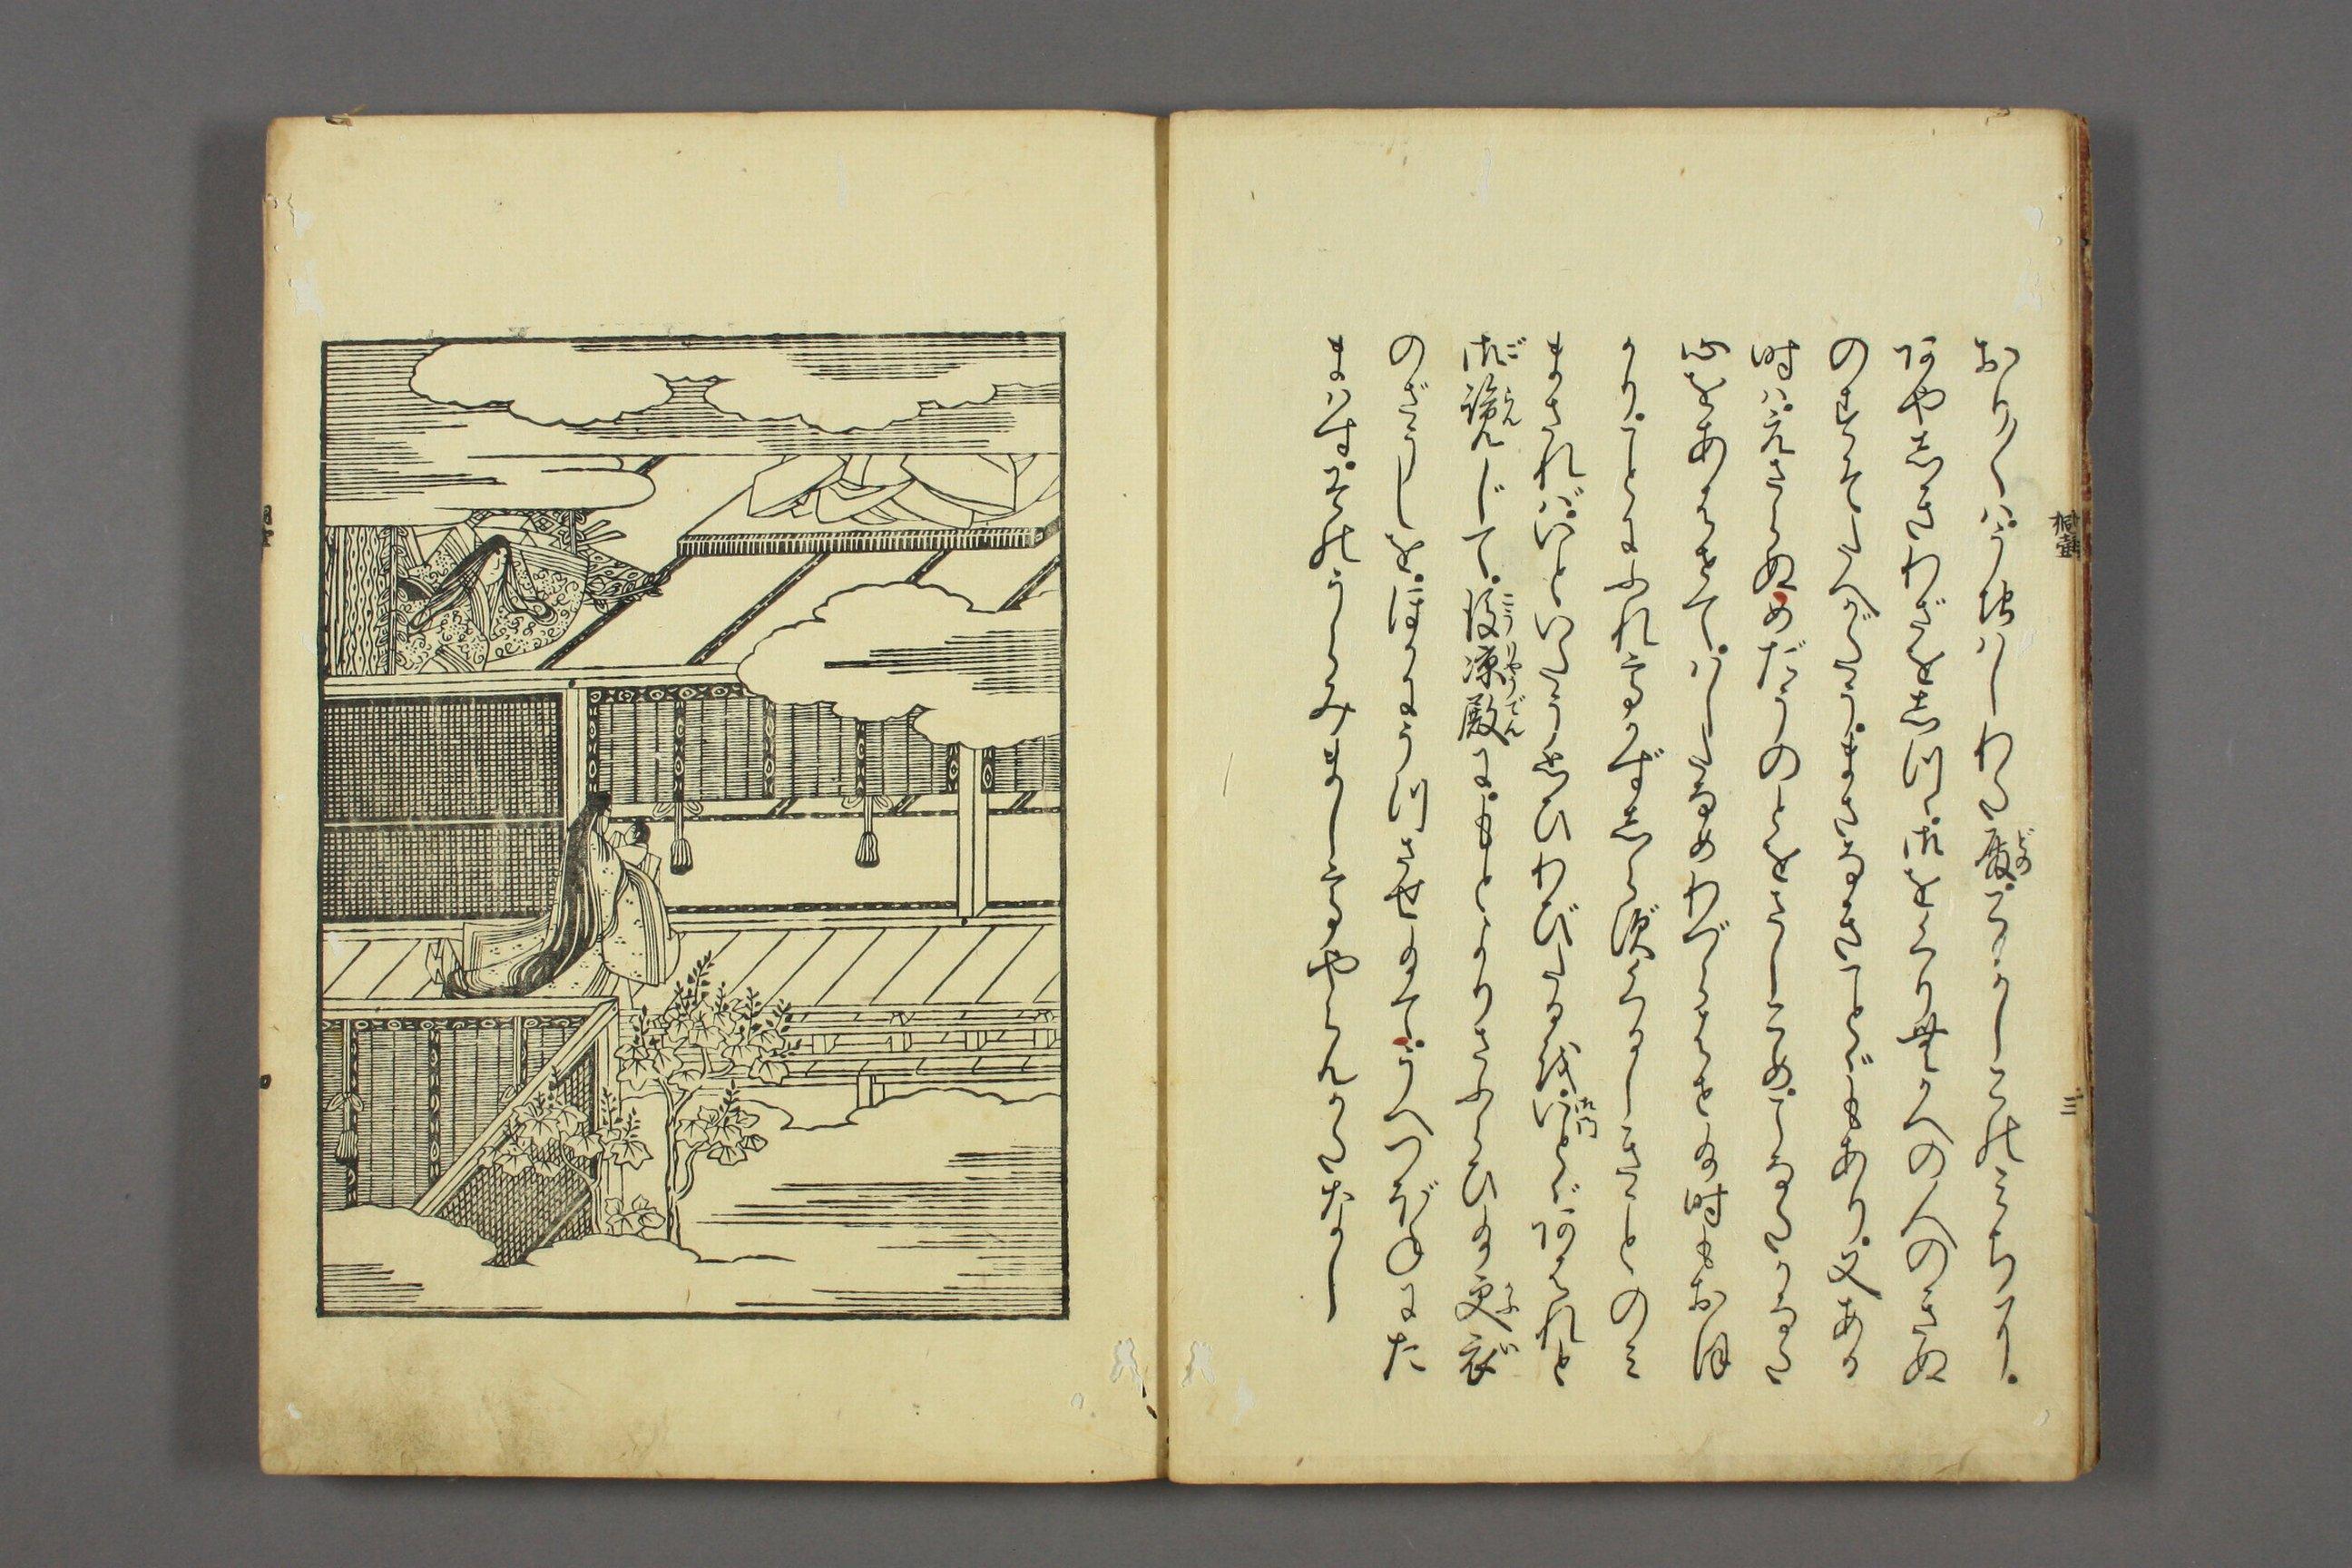 http://archive.wul.waseda.ac.jp/kosho/bunko30/bunko30_a0007/bunko30_a0007_0001/bunko30_a0007_0001_p0005.jpg